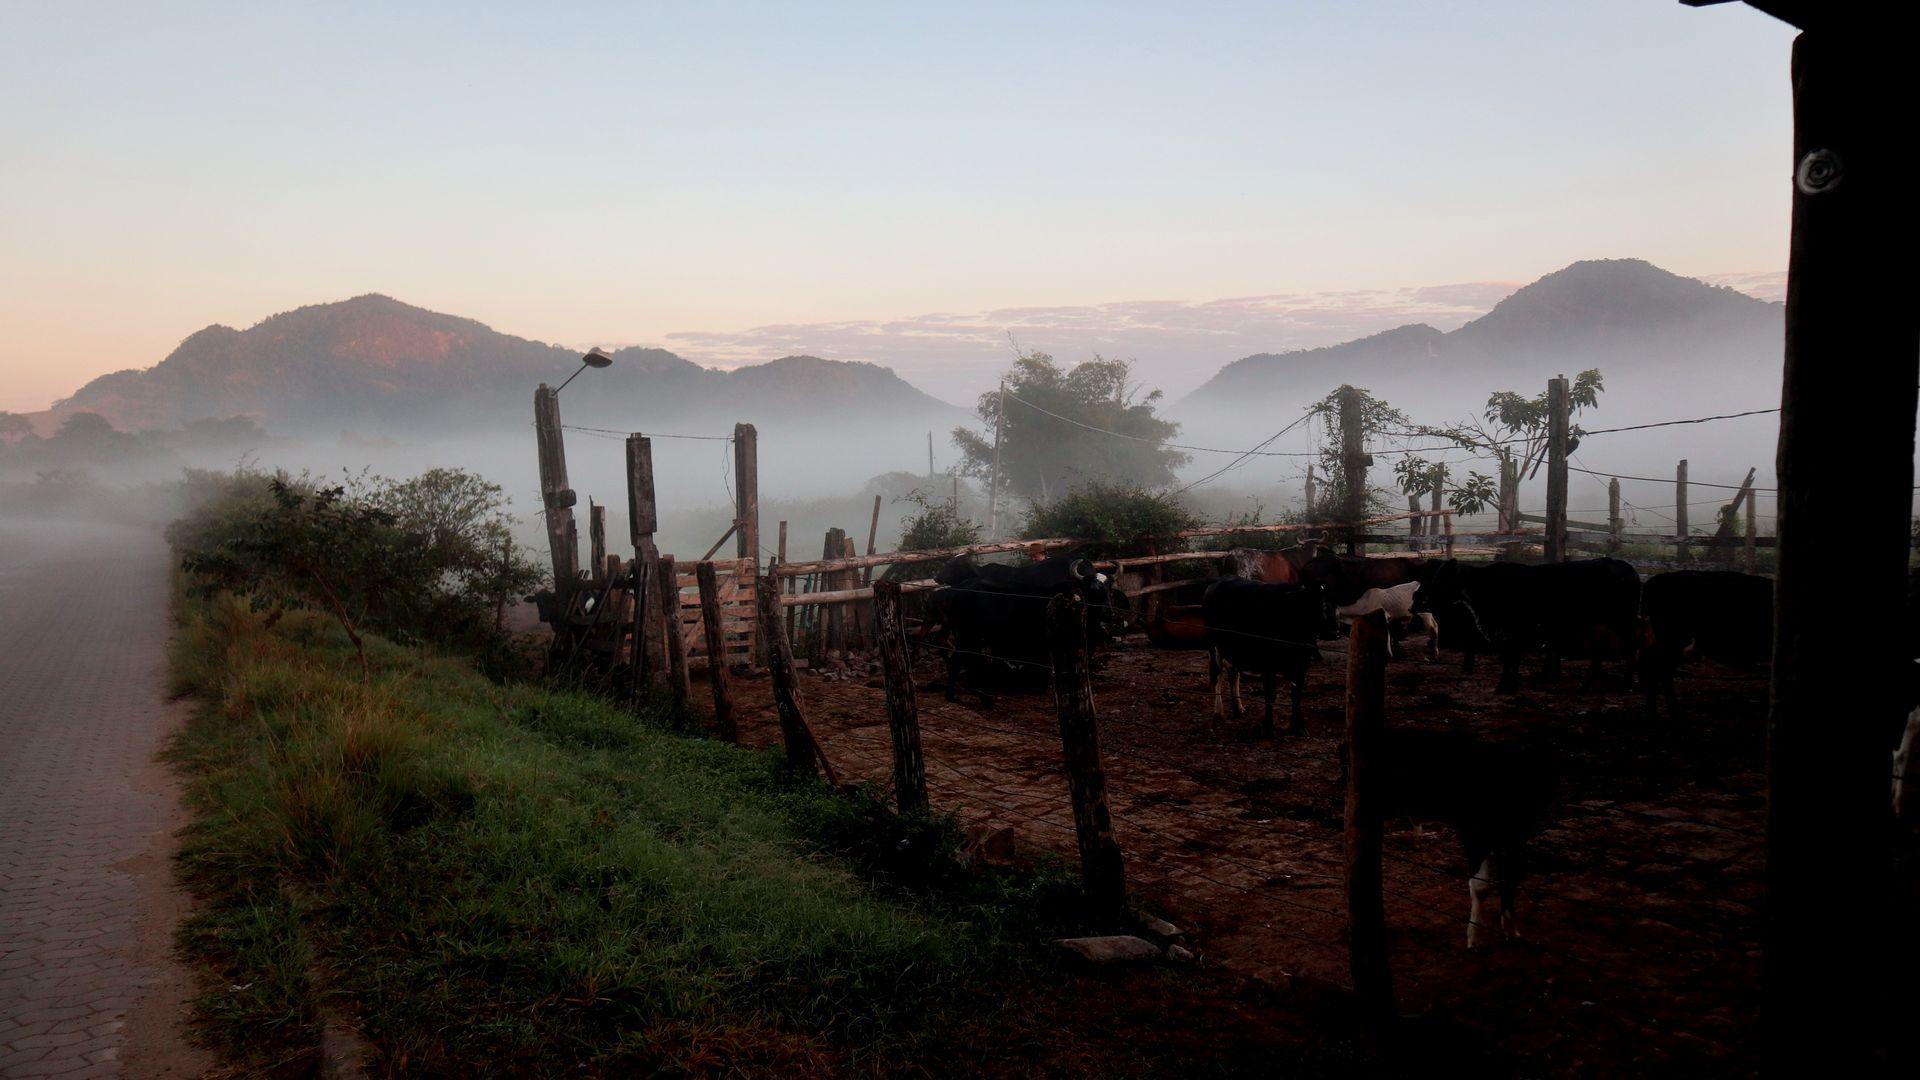 Data: 09/06/2020 - ES - Serra - Gilven Antônio Piazzollo, produtor rural retirando leite para vender - Editoria: Cidades - Foto: Ricardo Medeiros - GZ